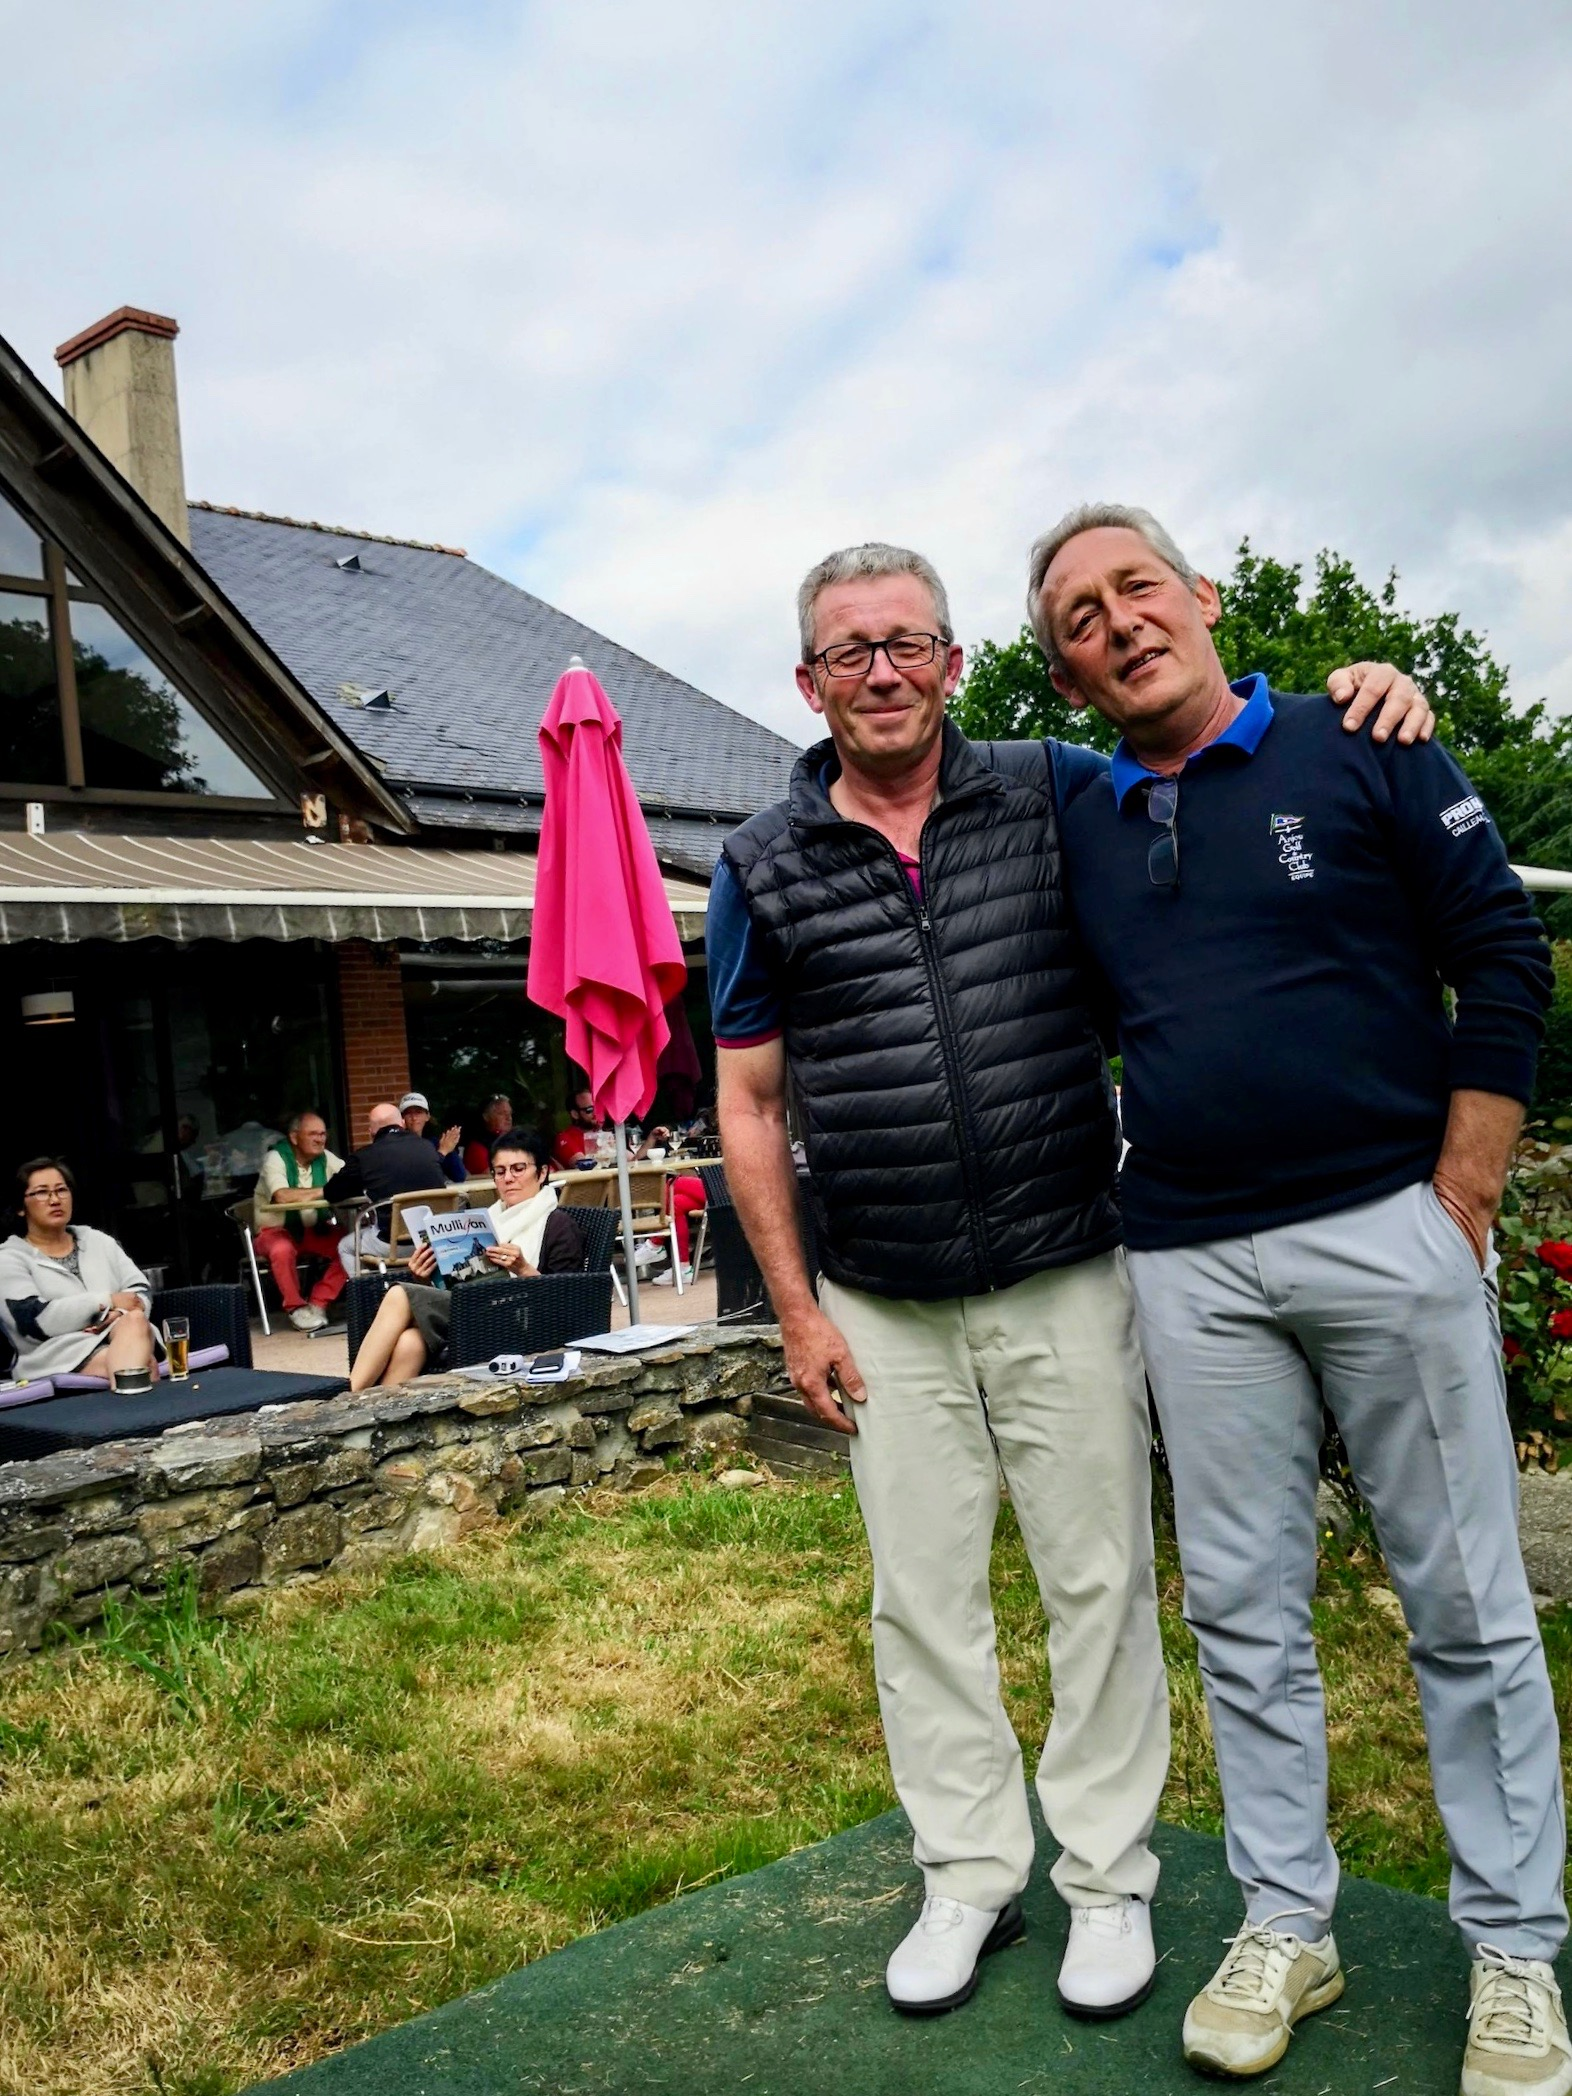 Cailleau Pneus Anjou Golf Frédéric Livenais avec Patric Hameon Association Sportive